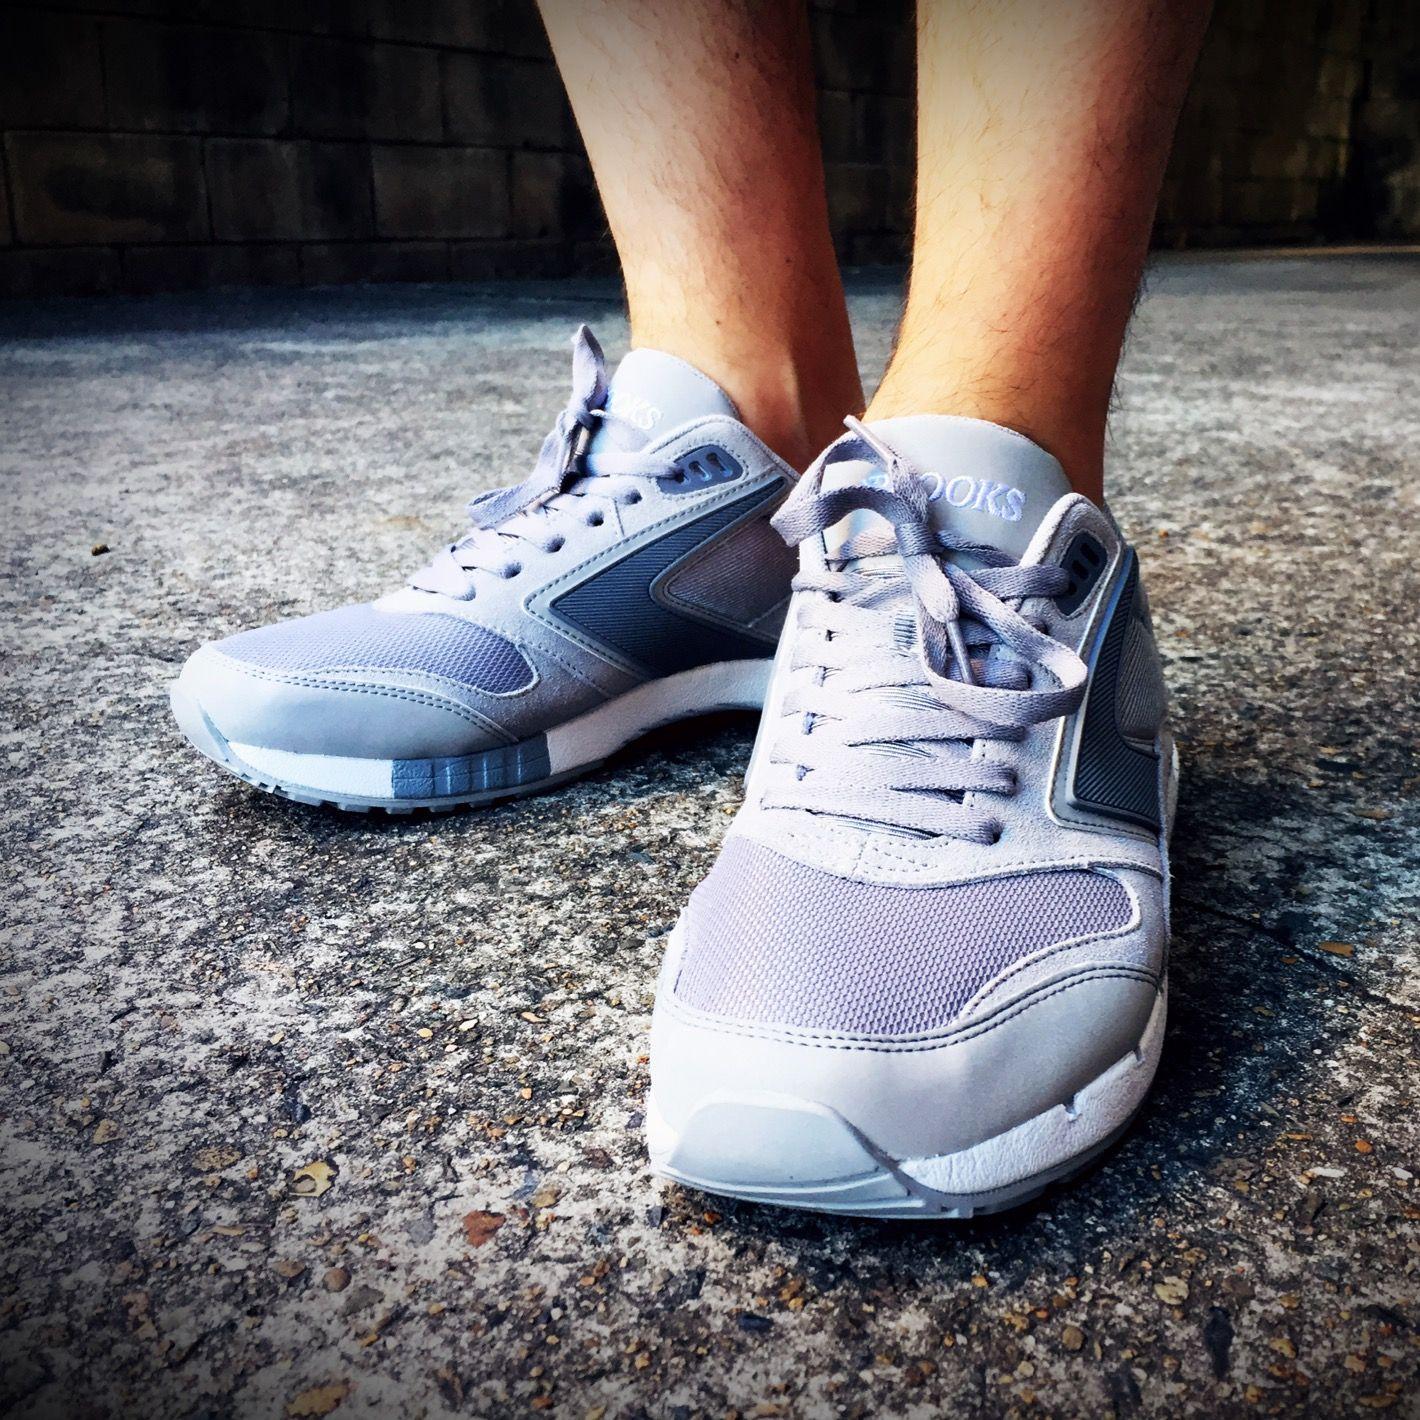 Brooks Fusion | Sneakers, Brooks